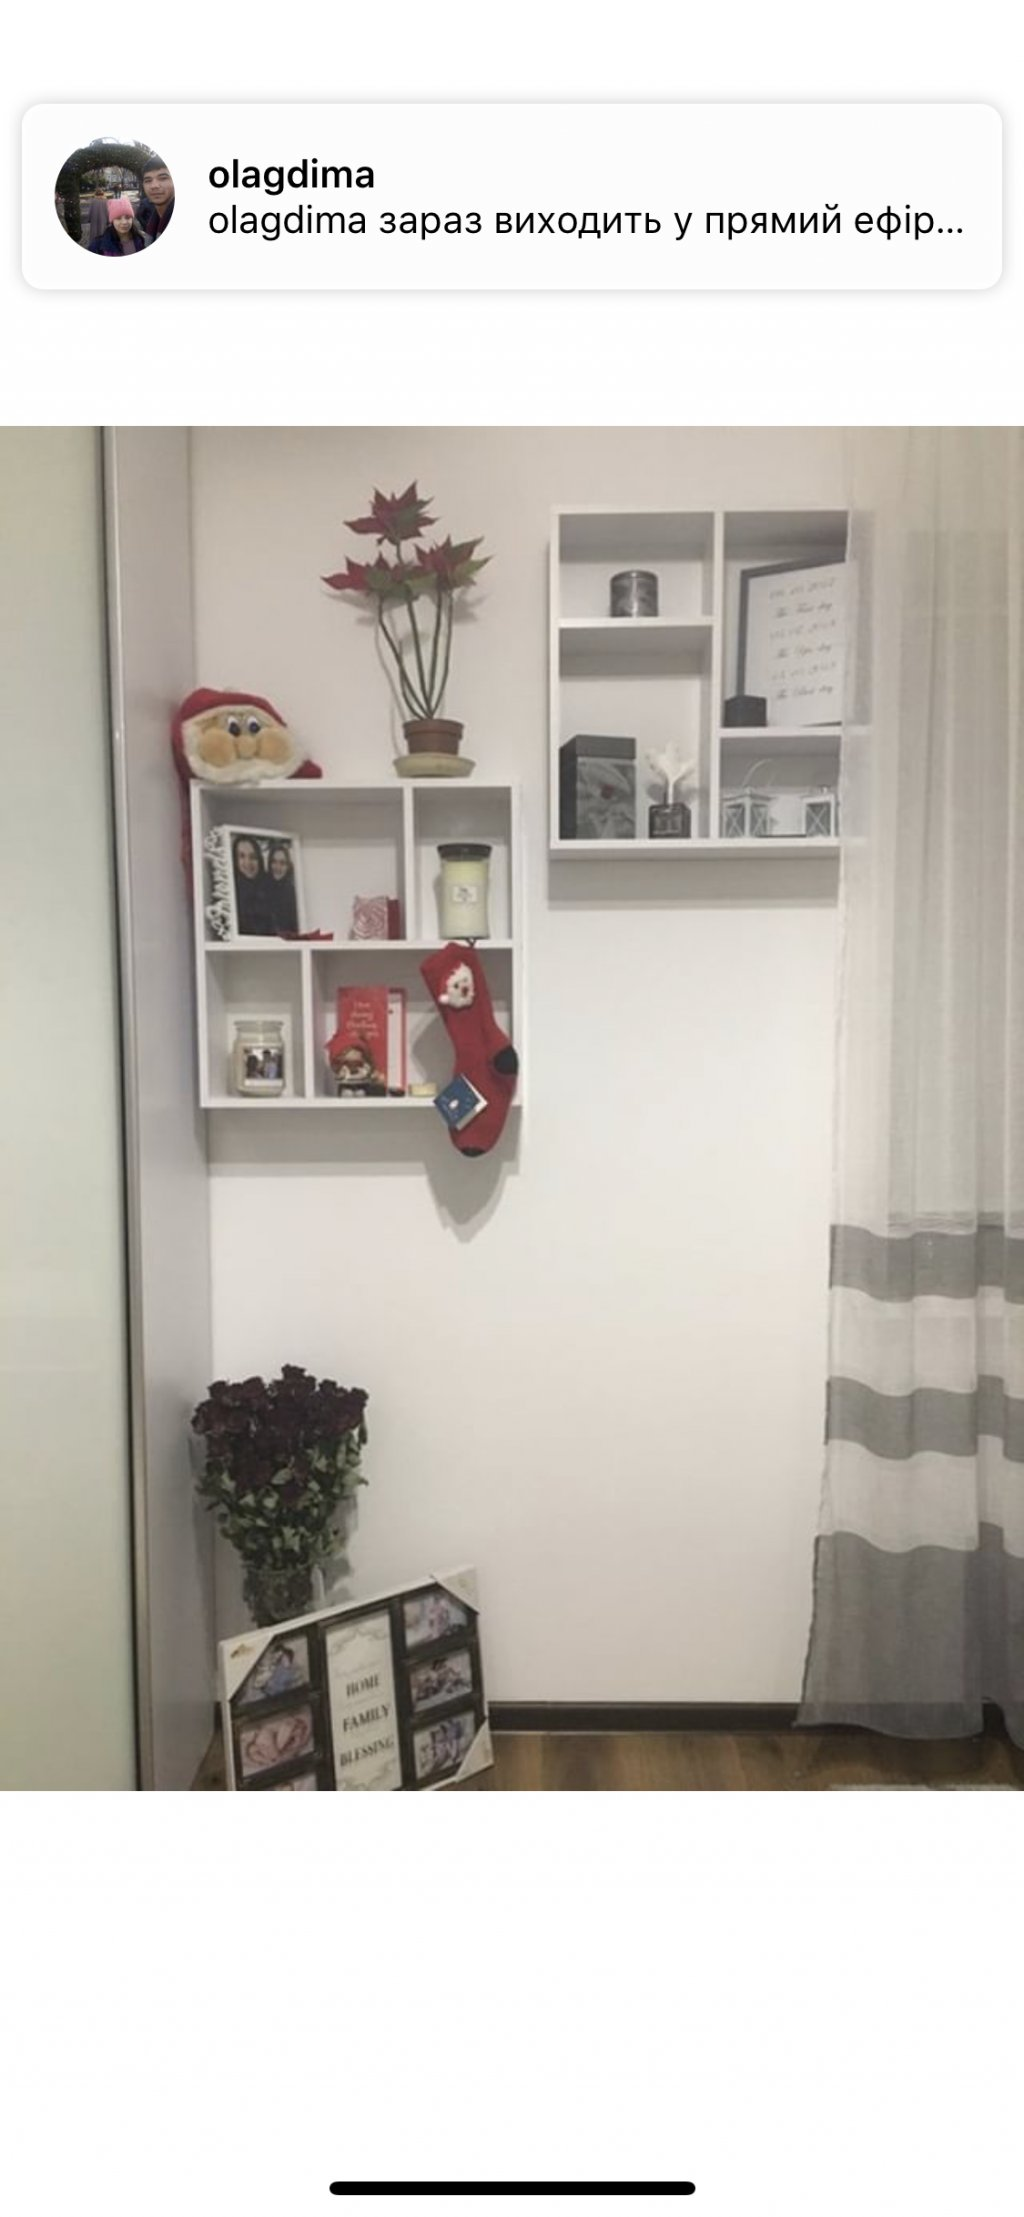 Ideamebli.com интернет магазин мебели - Отличный магазин мебели!